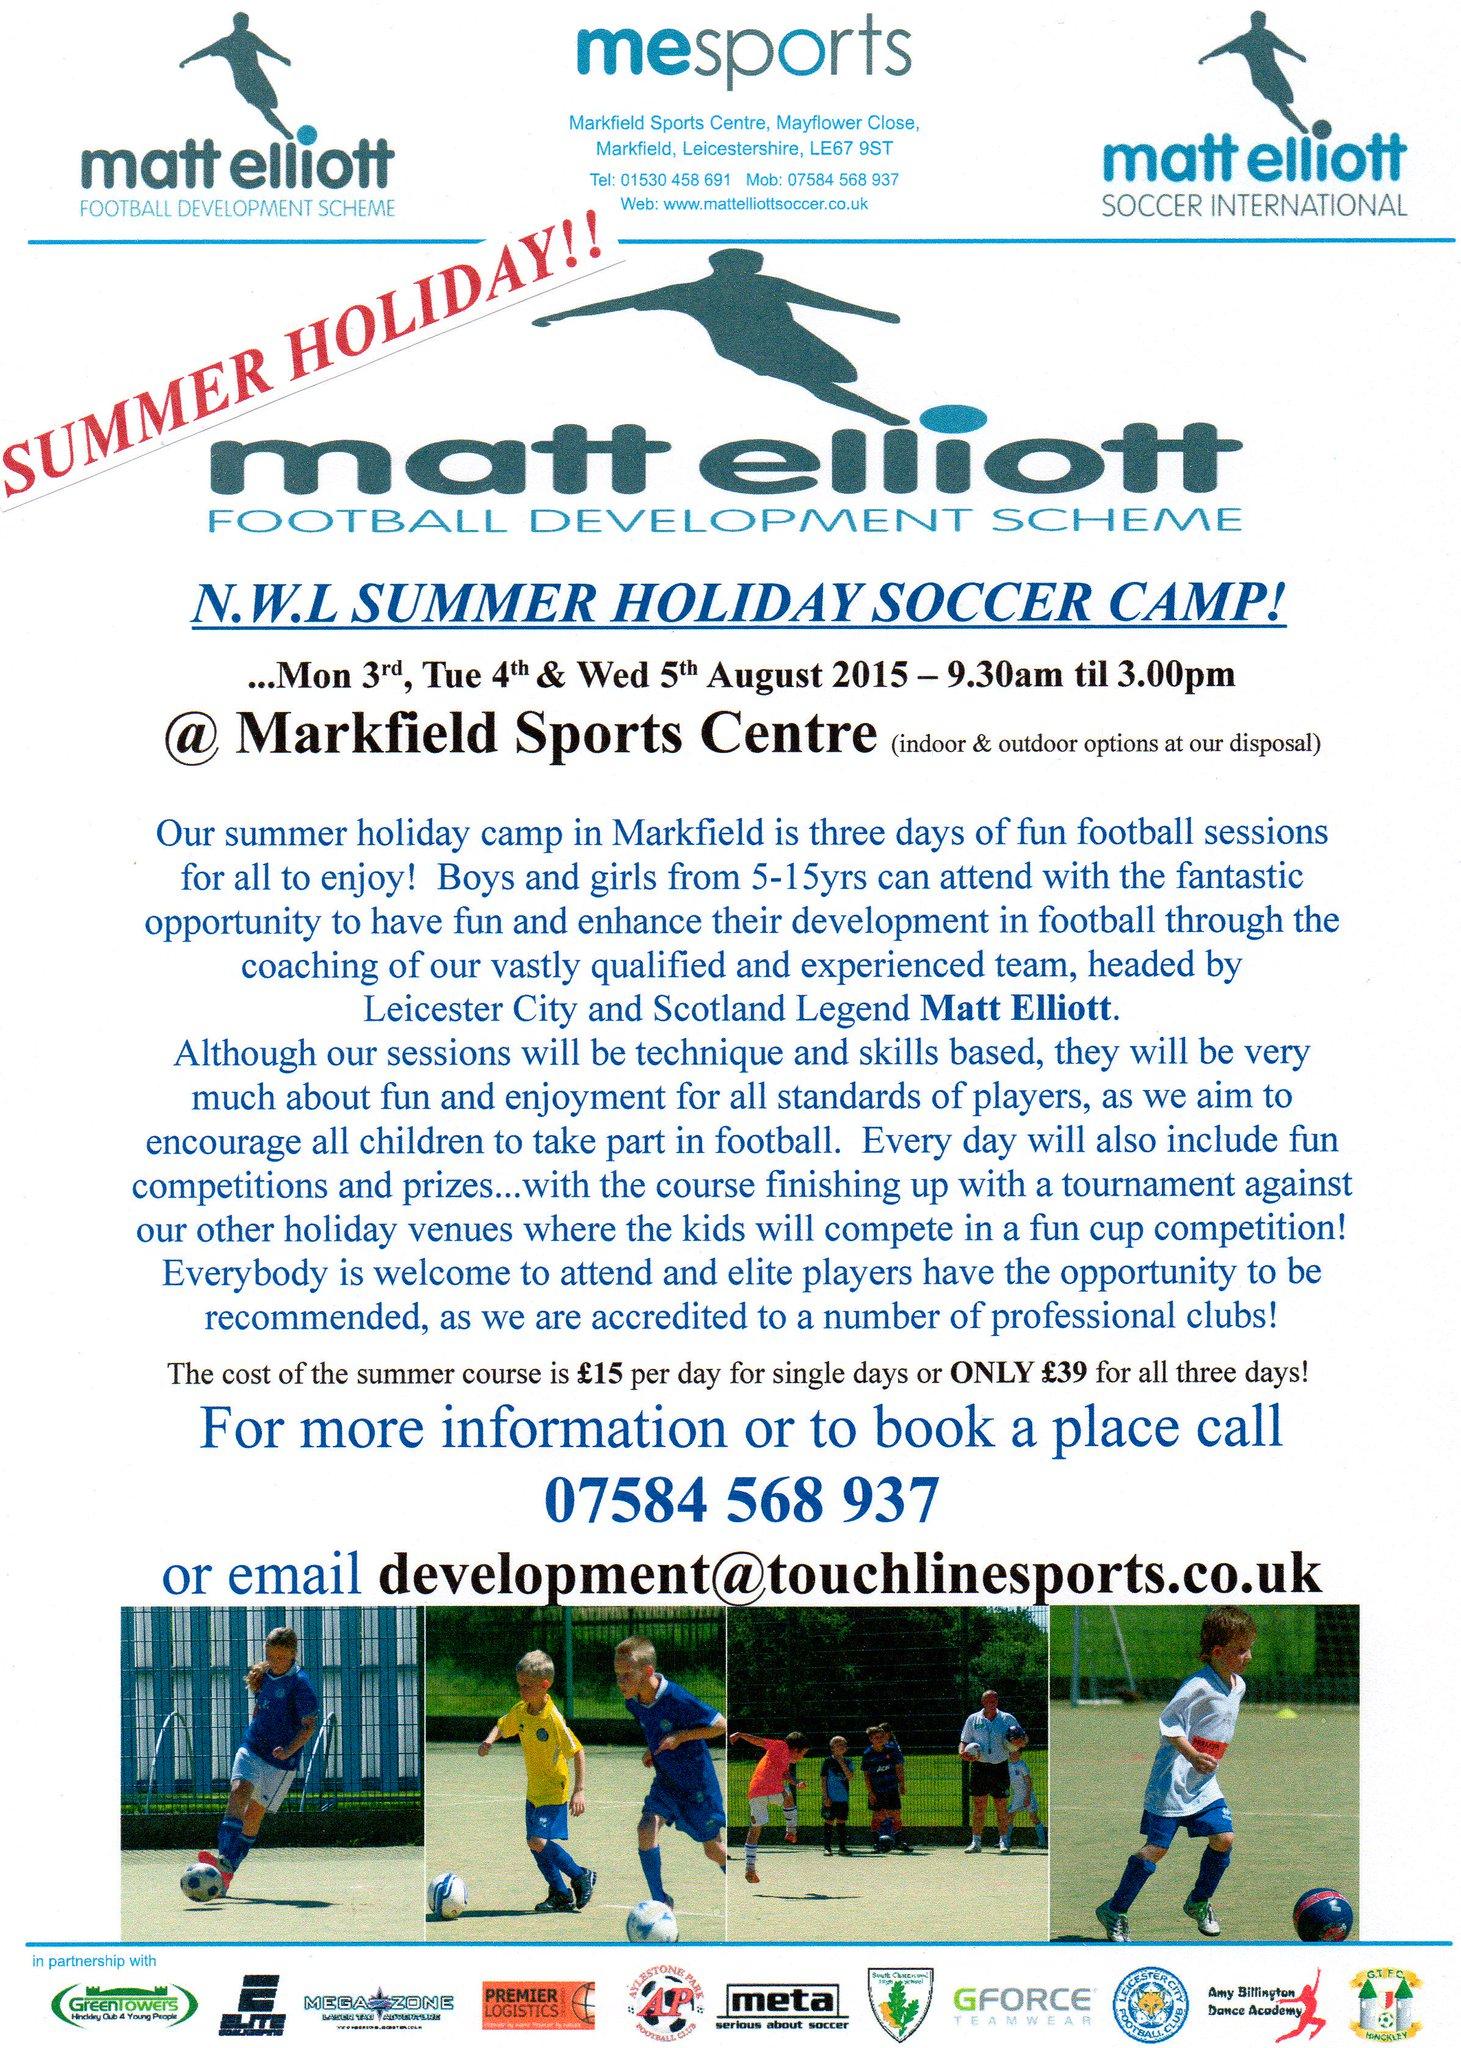 RT @MElliottSoccer: N.W LEICS SUMMER SOCCER CAMP - 3rd, 4th & 5th August @ MARKFIELD COMMUNITY & SPORTS CENTRE (5-15yrs)...See below... htt…